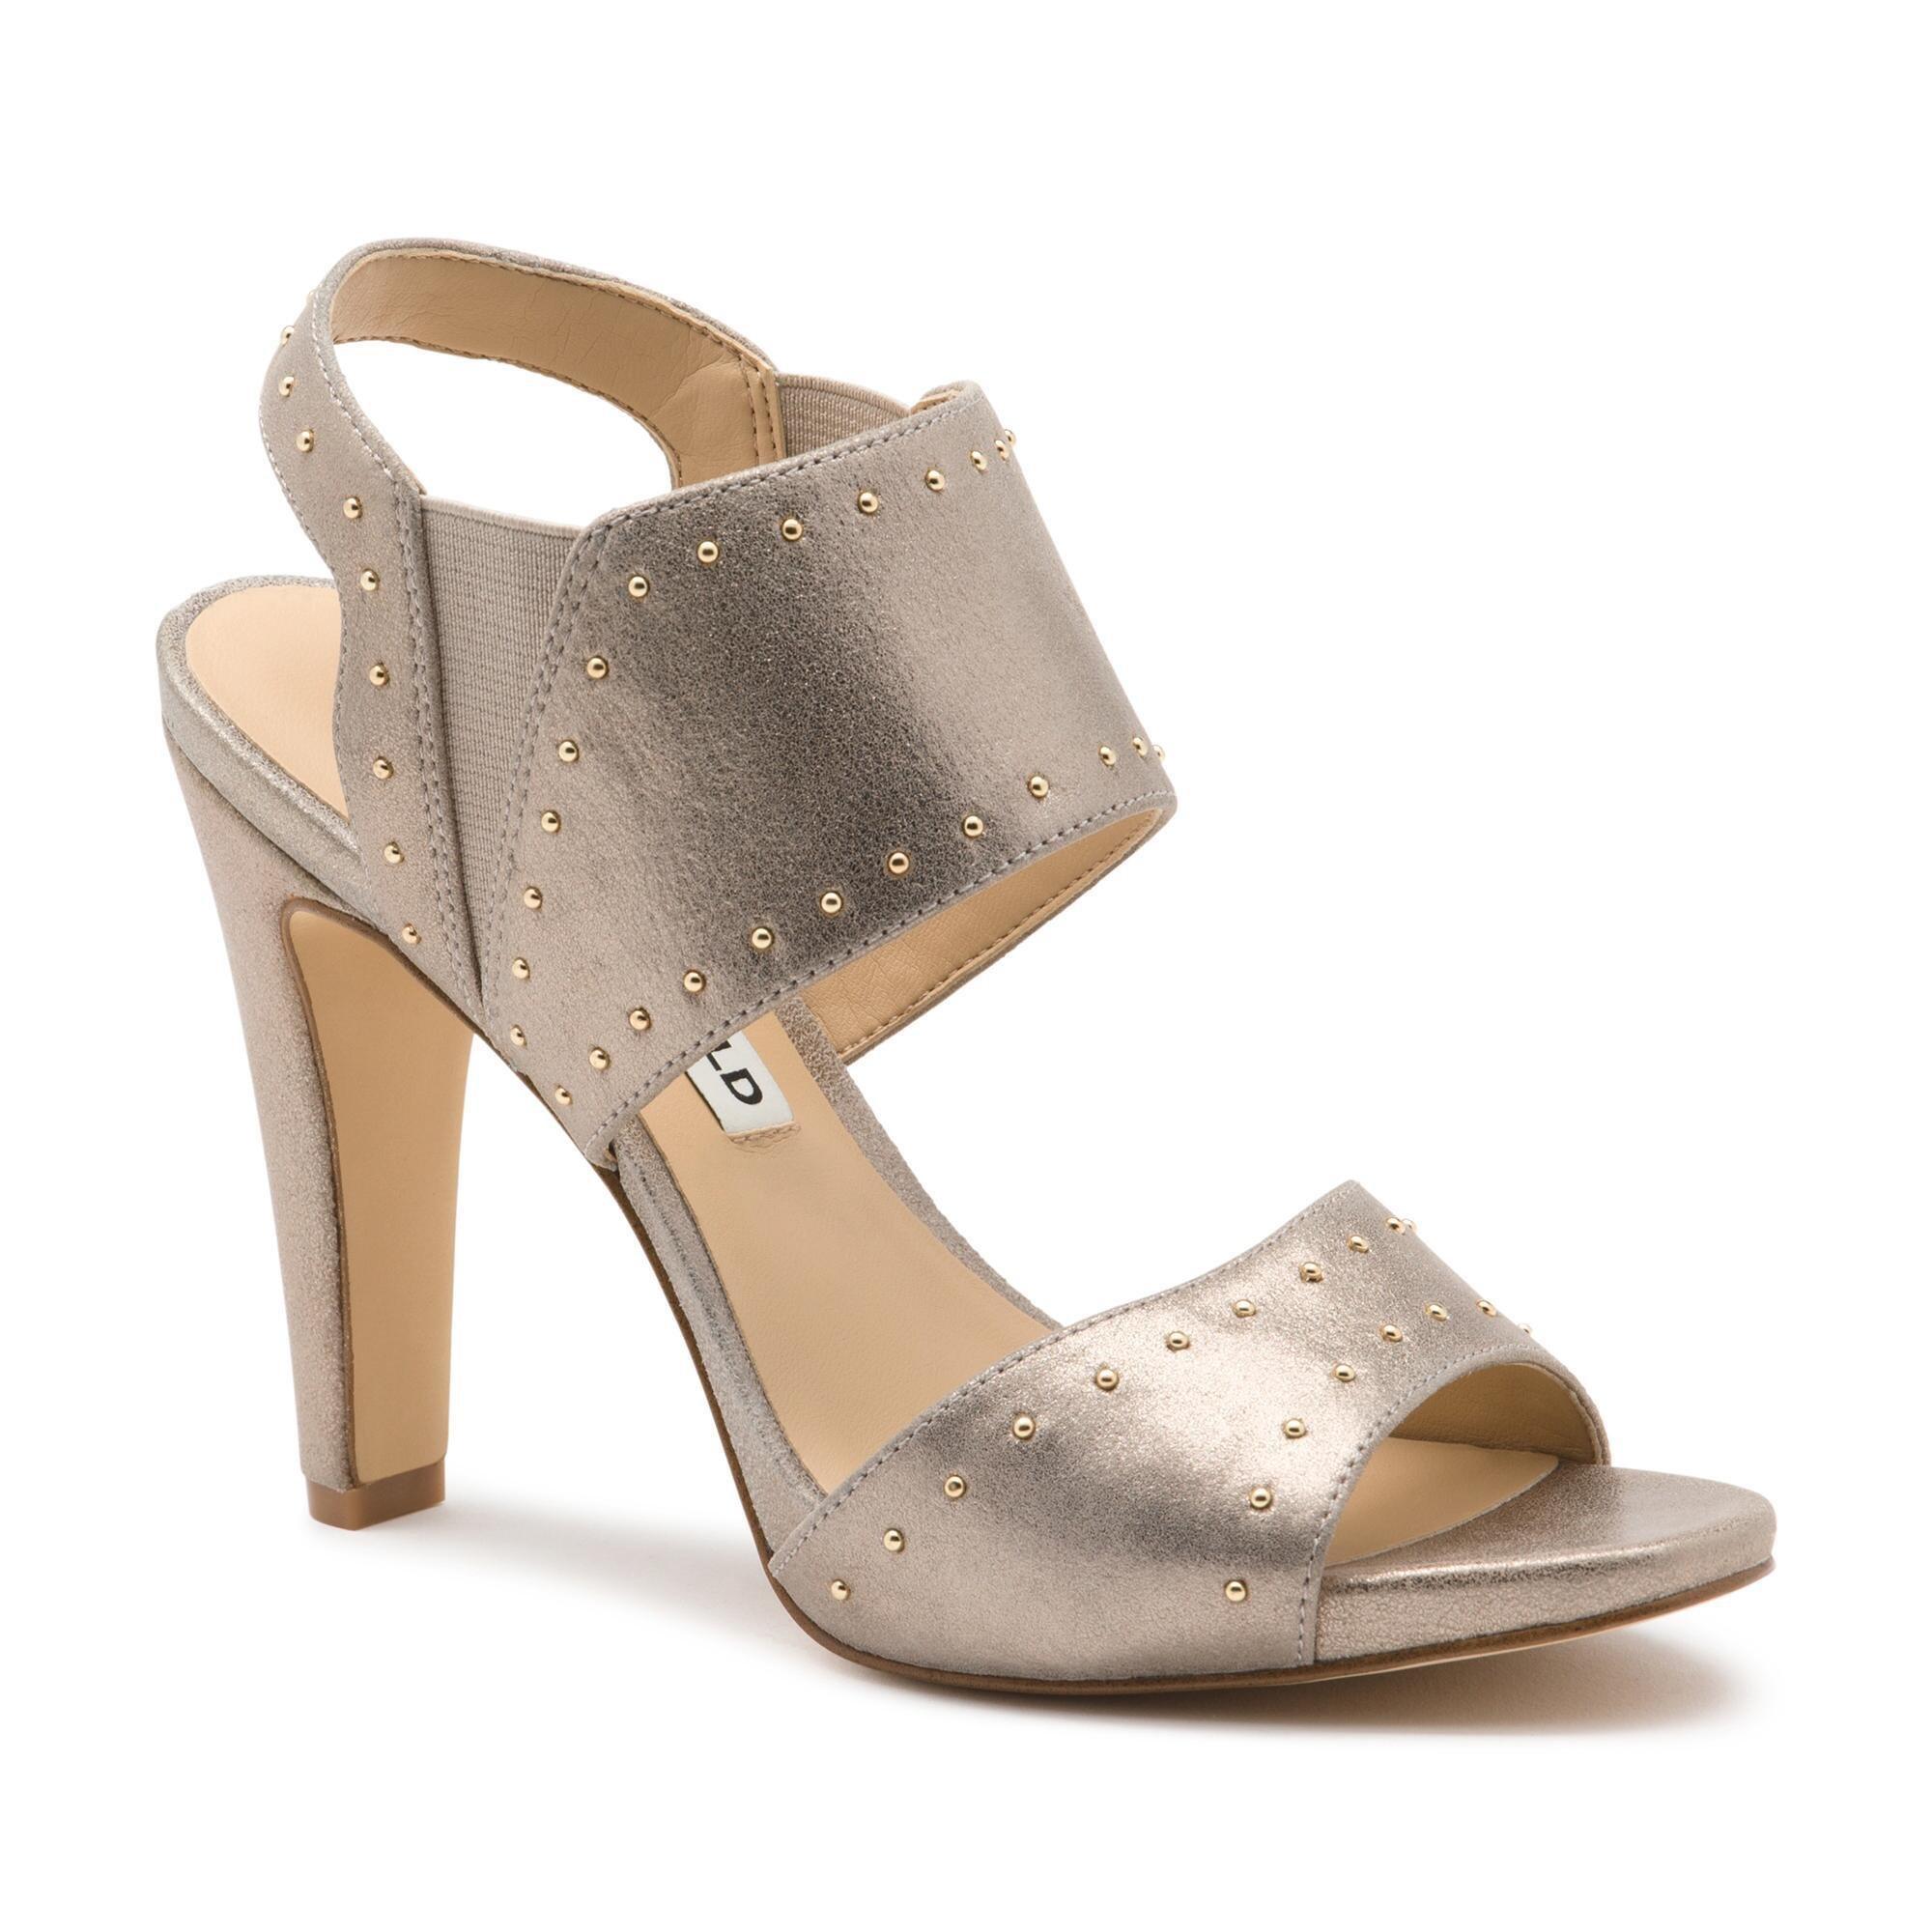 e195bbc5f6f Lyst - Karl Lagerfeld Coquete Studded Sandal in Metallic